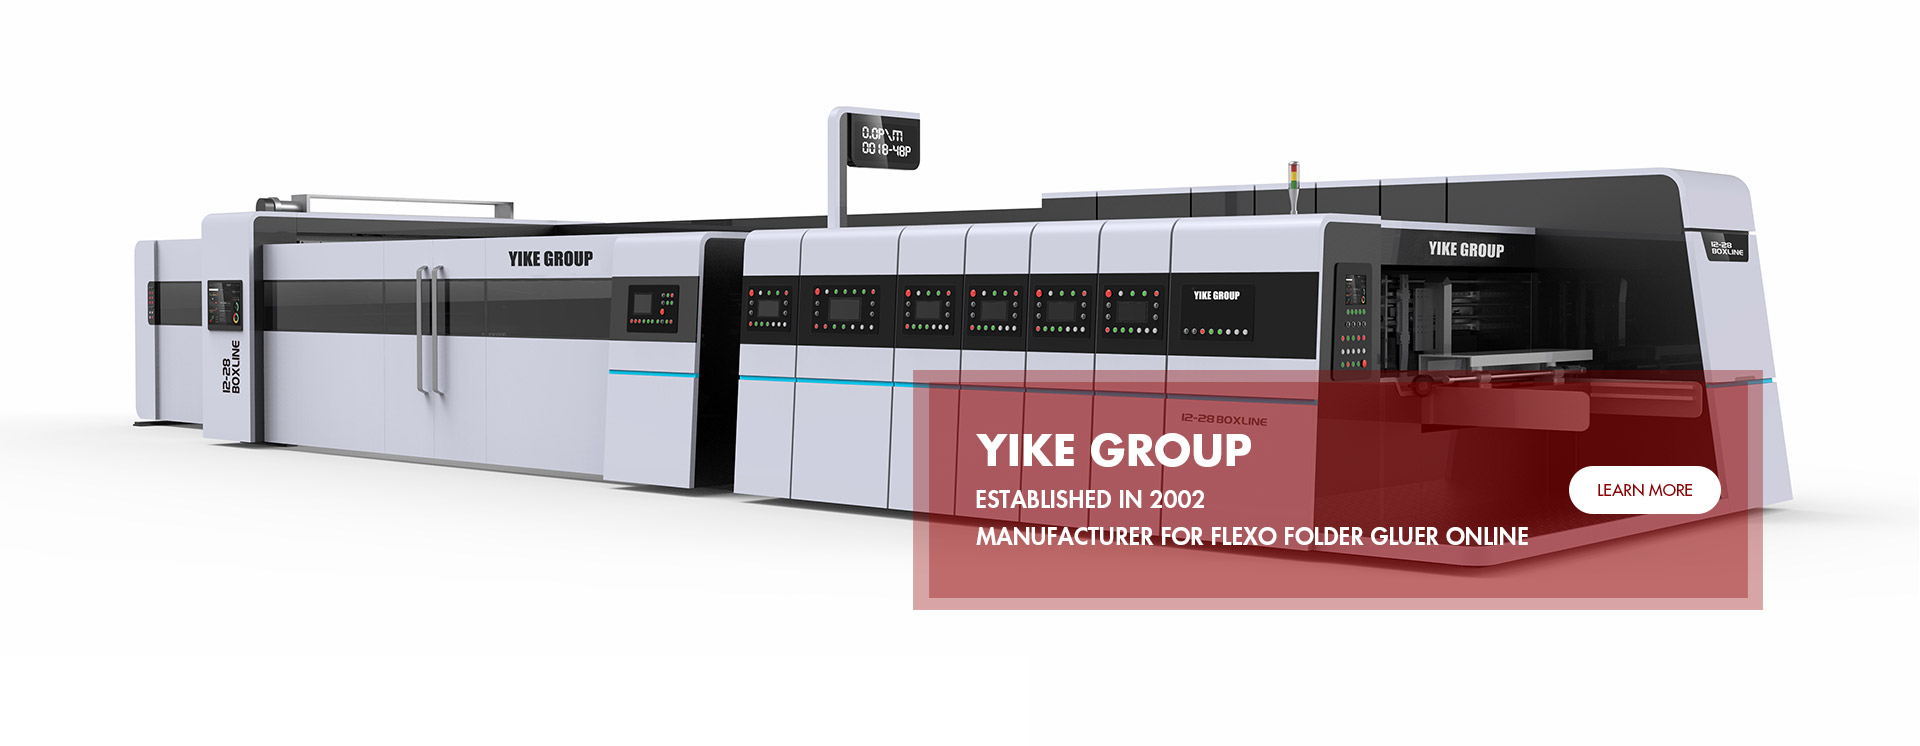 Flexo Printer Slotter folder gluer Machine YIKE GROUP